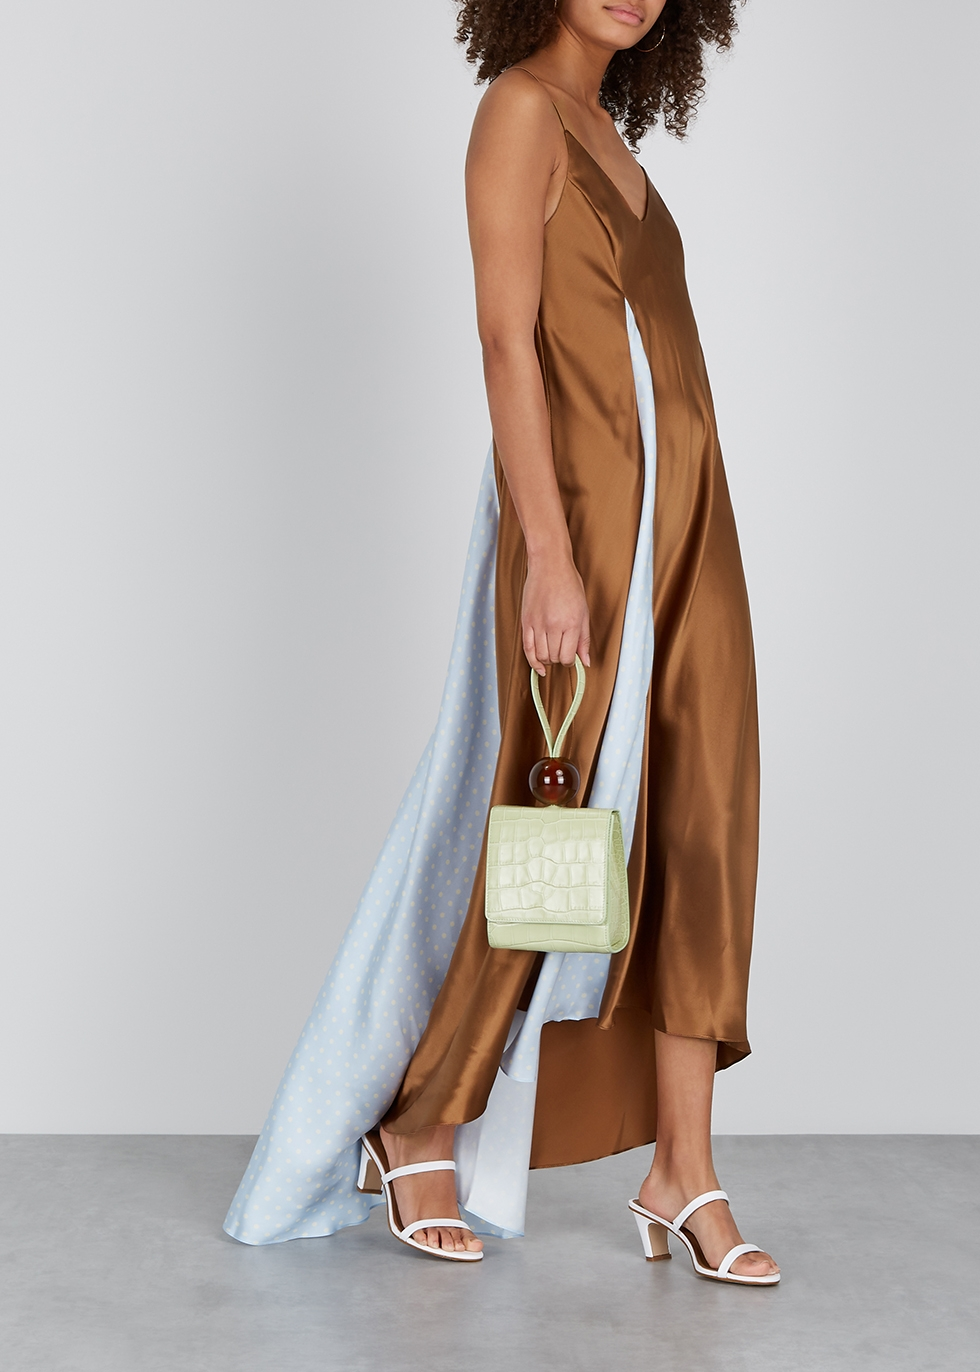 Chocolate brown silk maxi dress - Walk of Shame